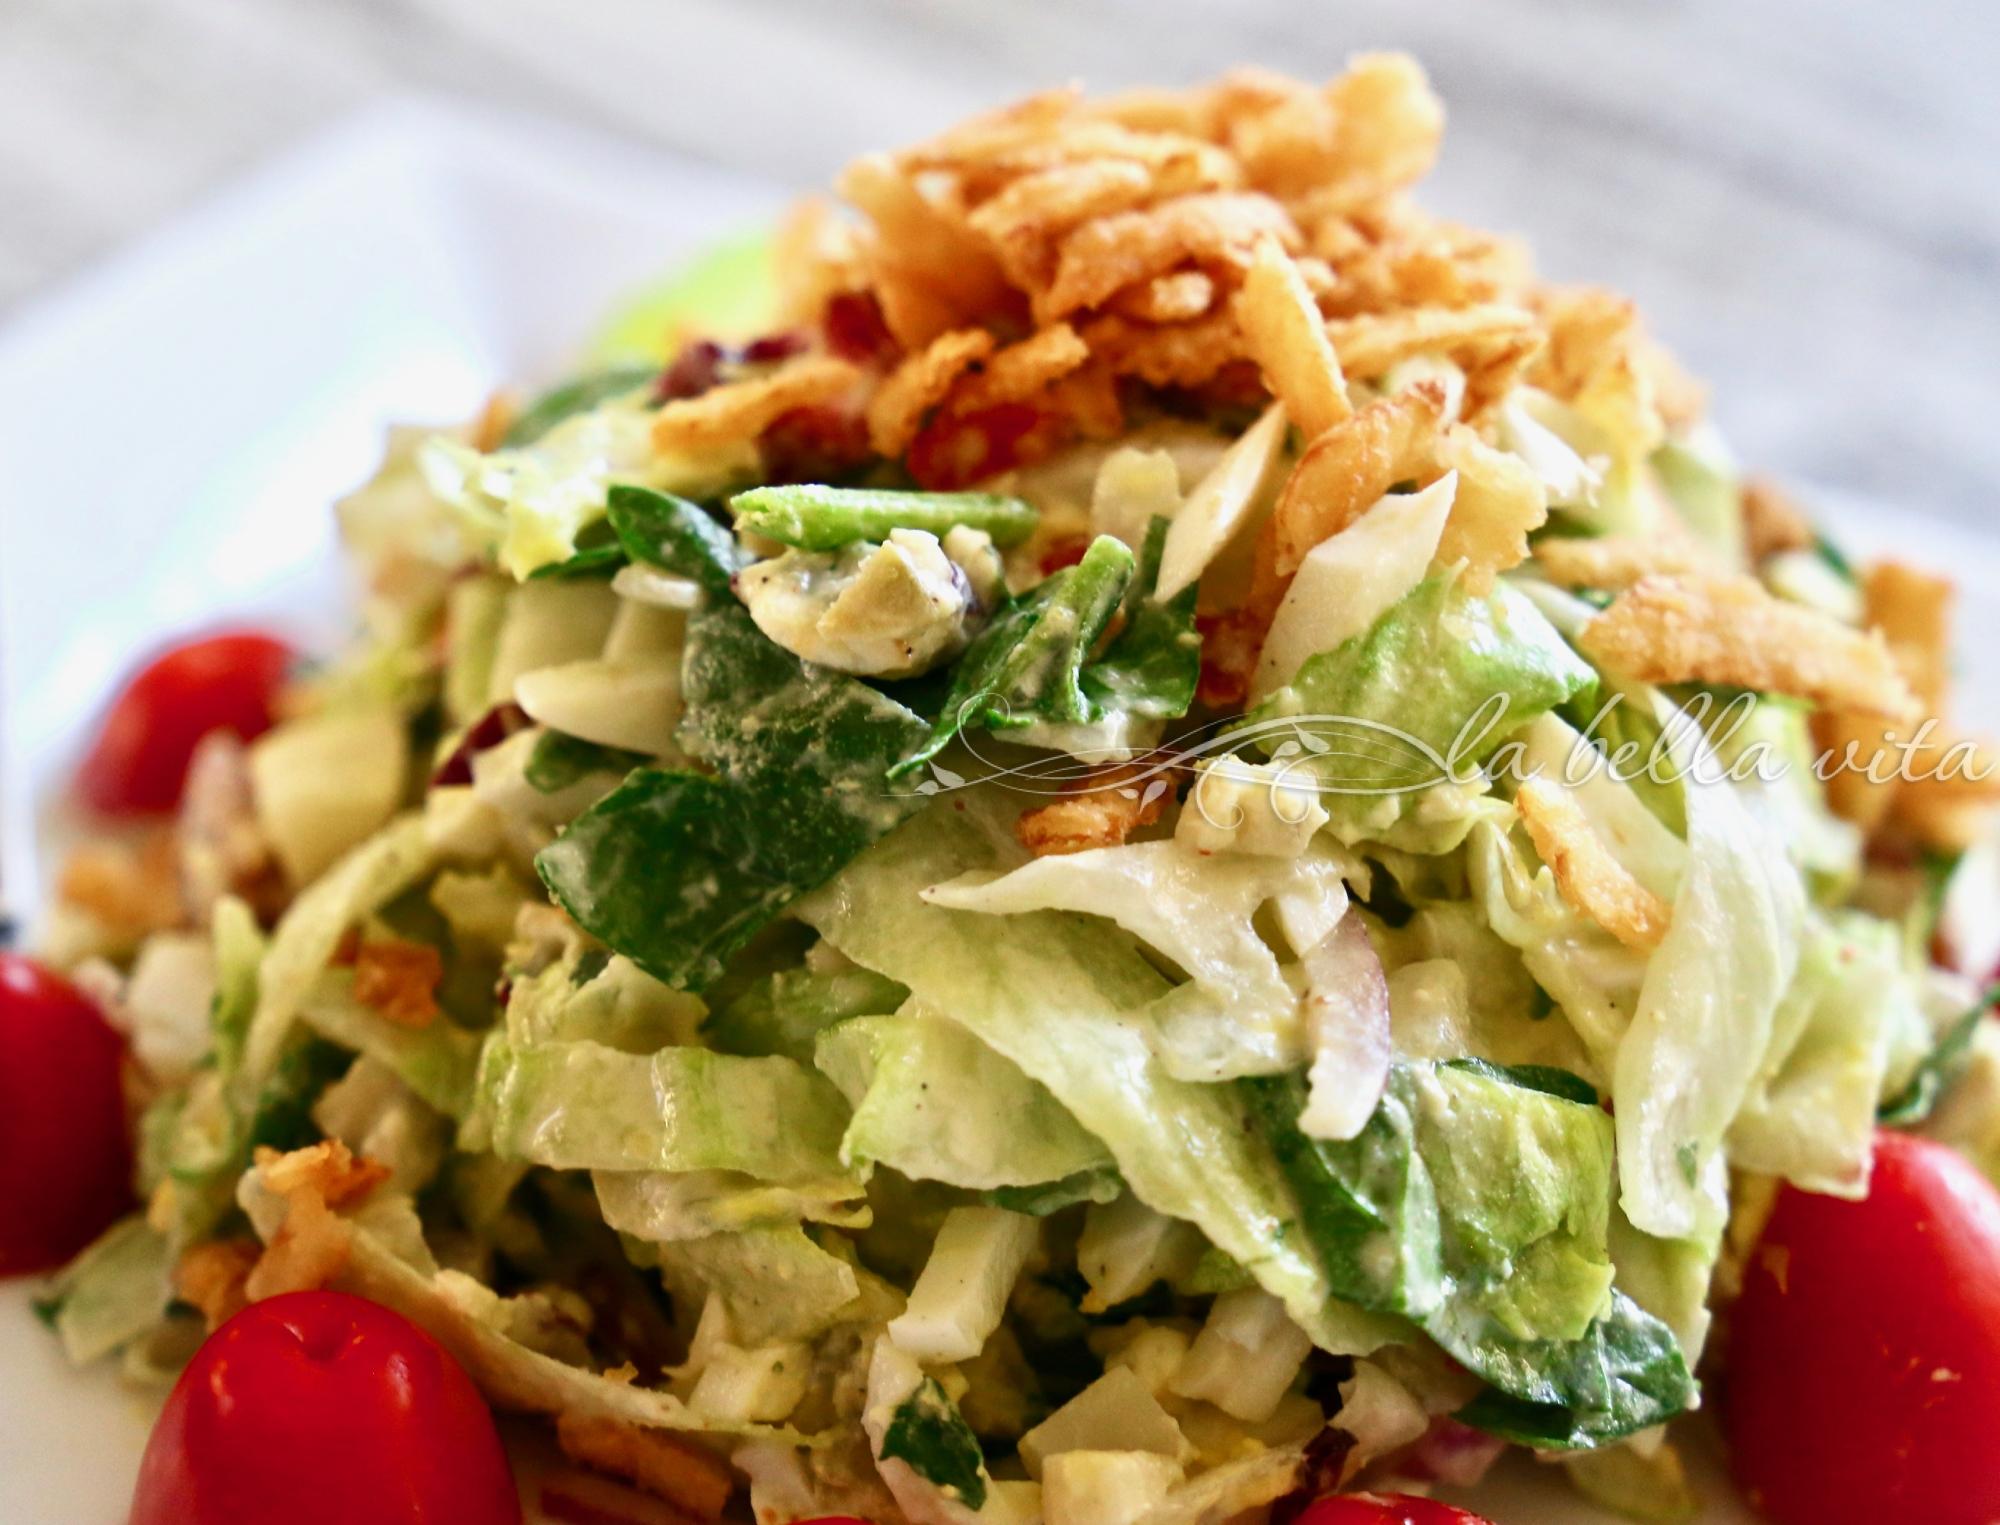 Ruth's Chris Steakhouse Chopped Salad - Copycat Recipe is SO DELICIOUS!! - La Bella Vita Cucina